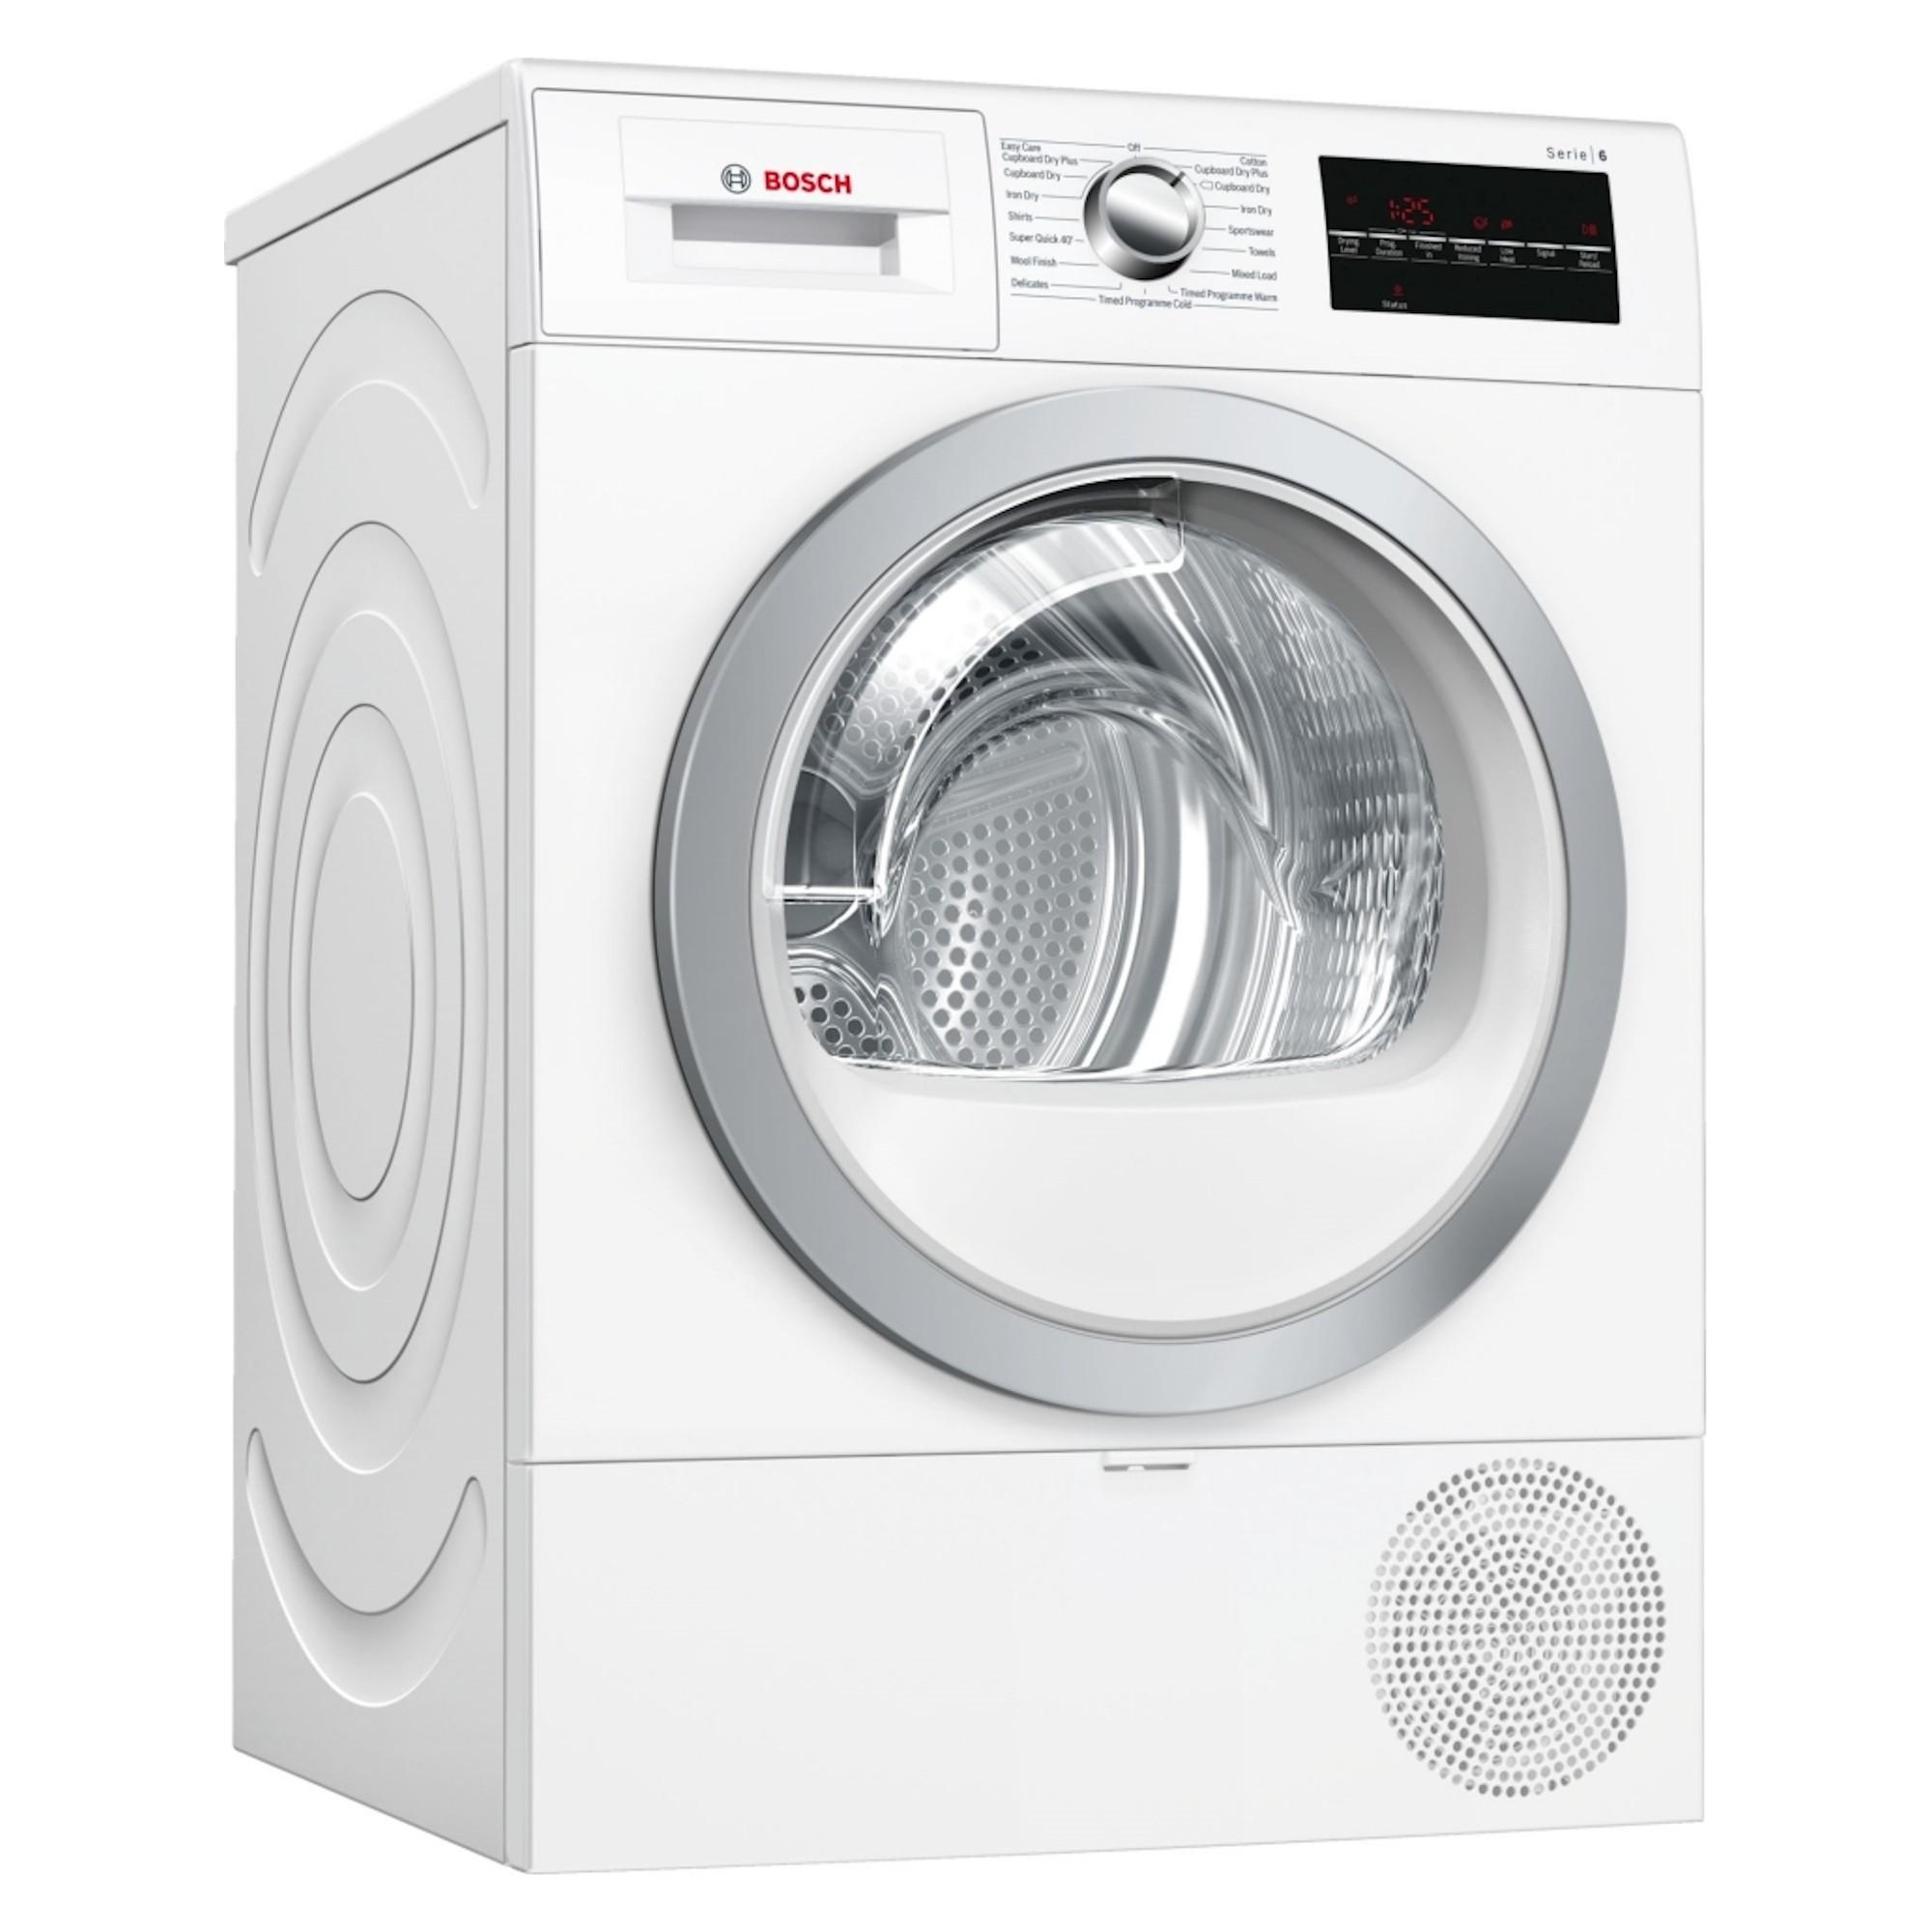 Bosch WTR88T81GB 8kg Tumble Dryer